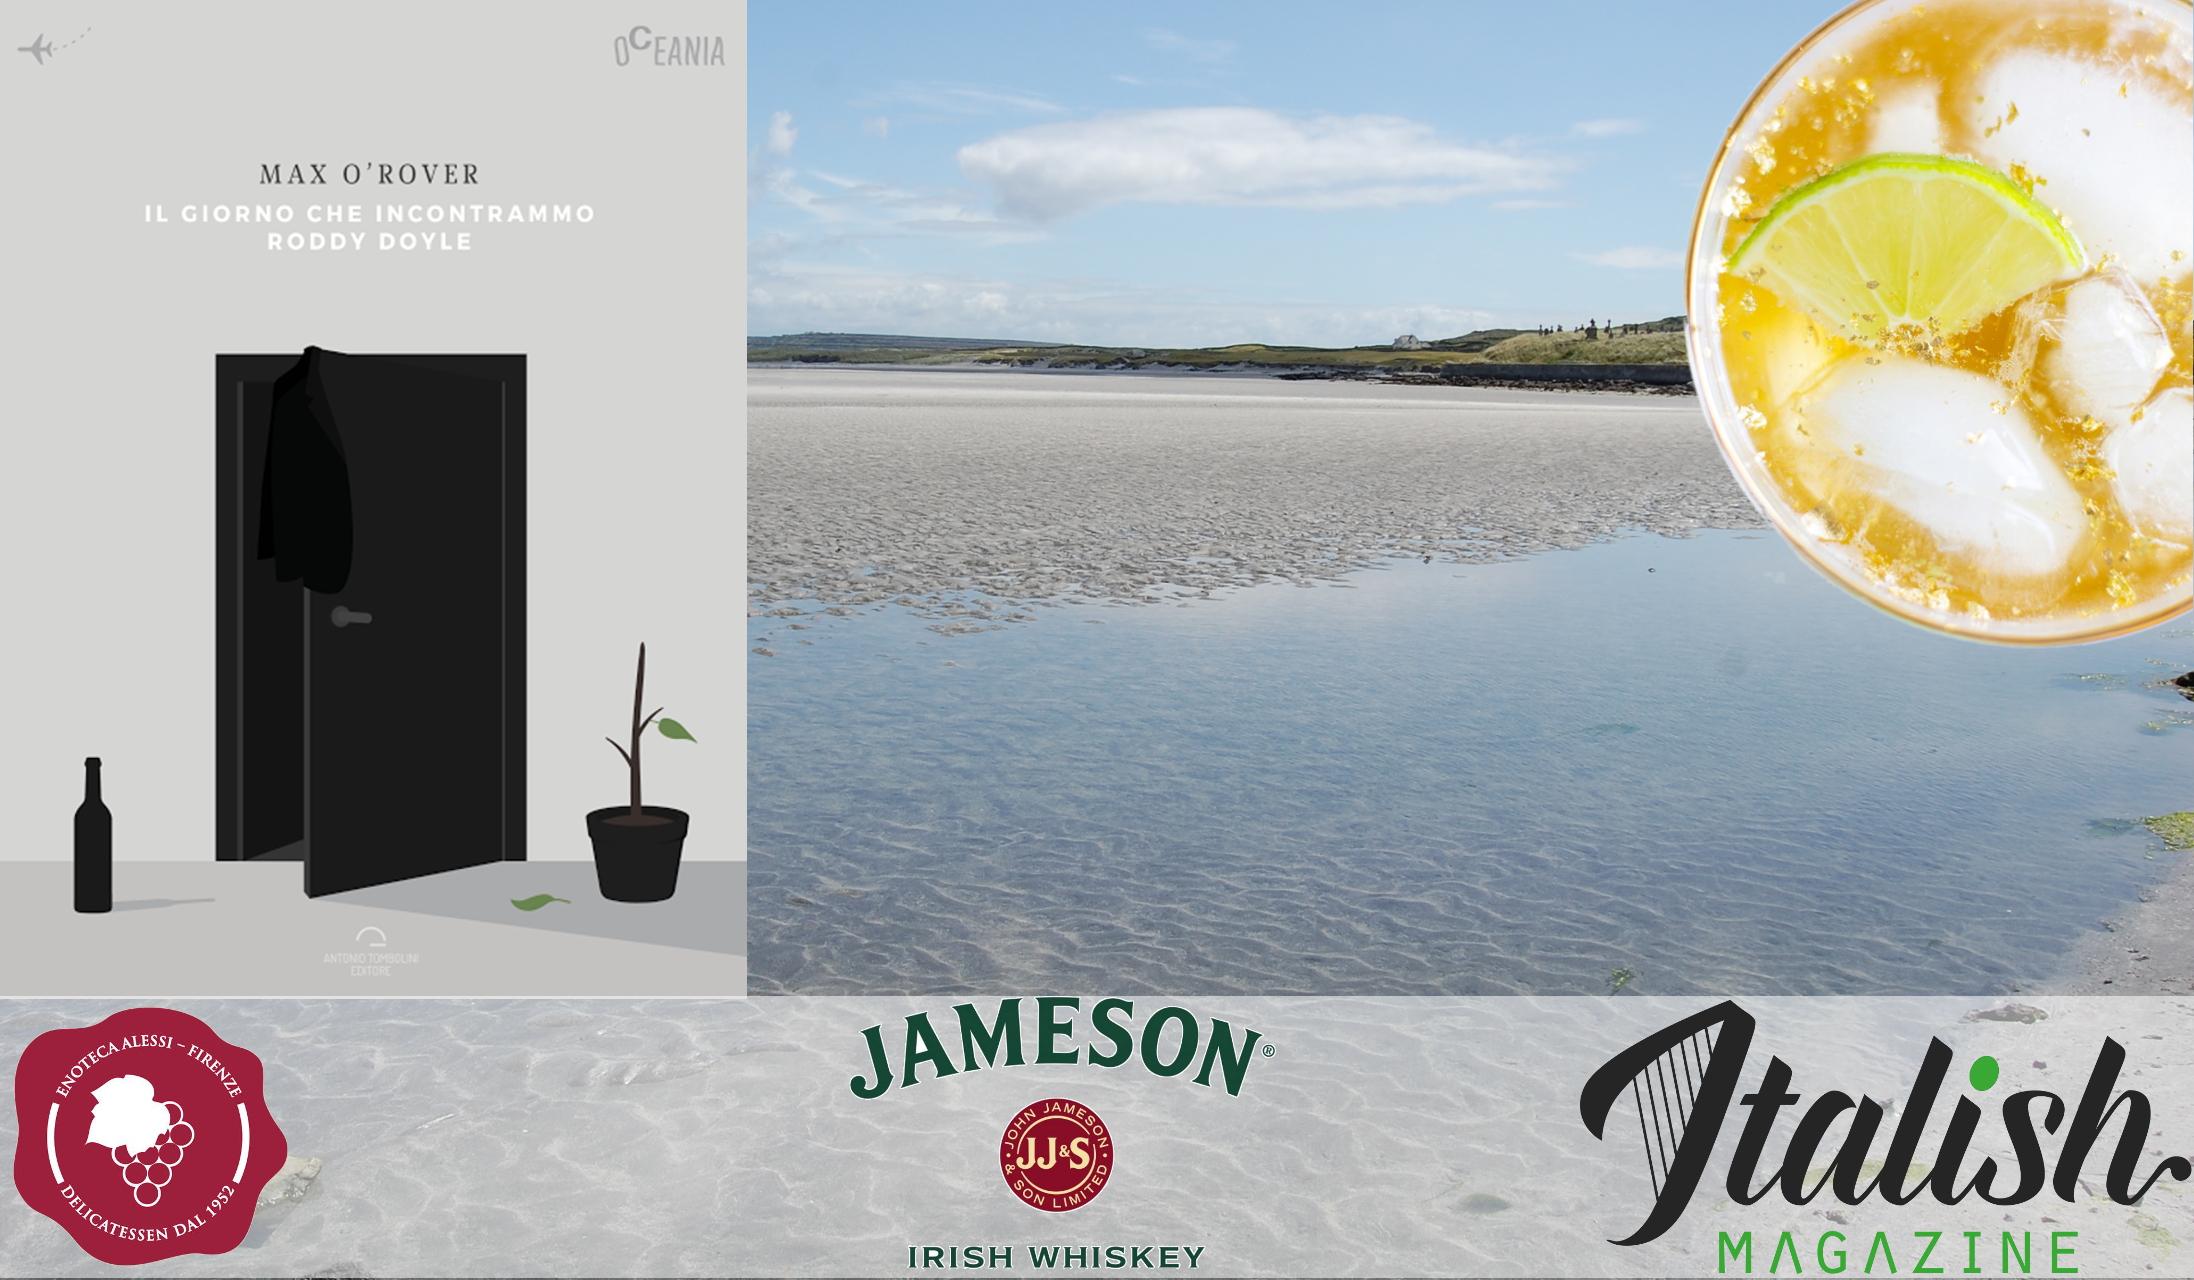 libri irlandesi - presentazione igcird enoteca alessi